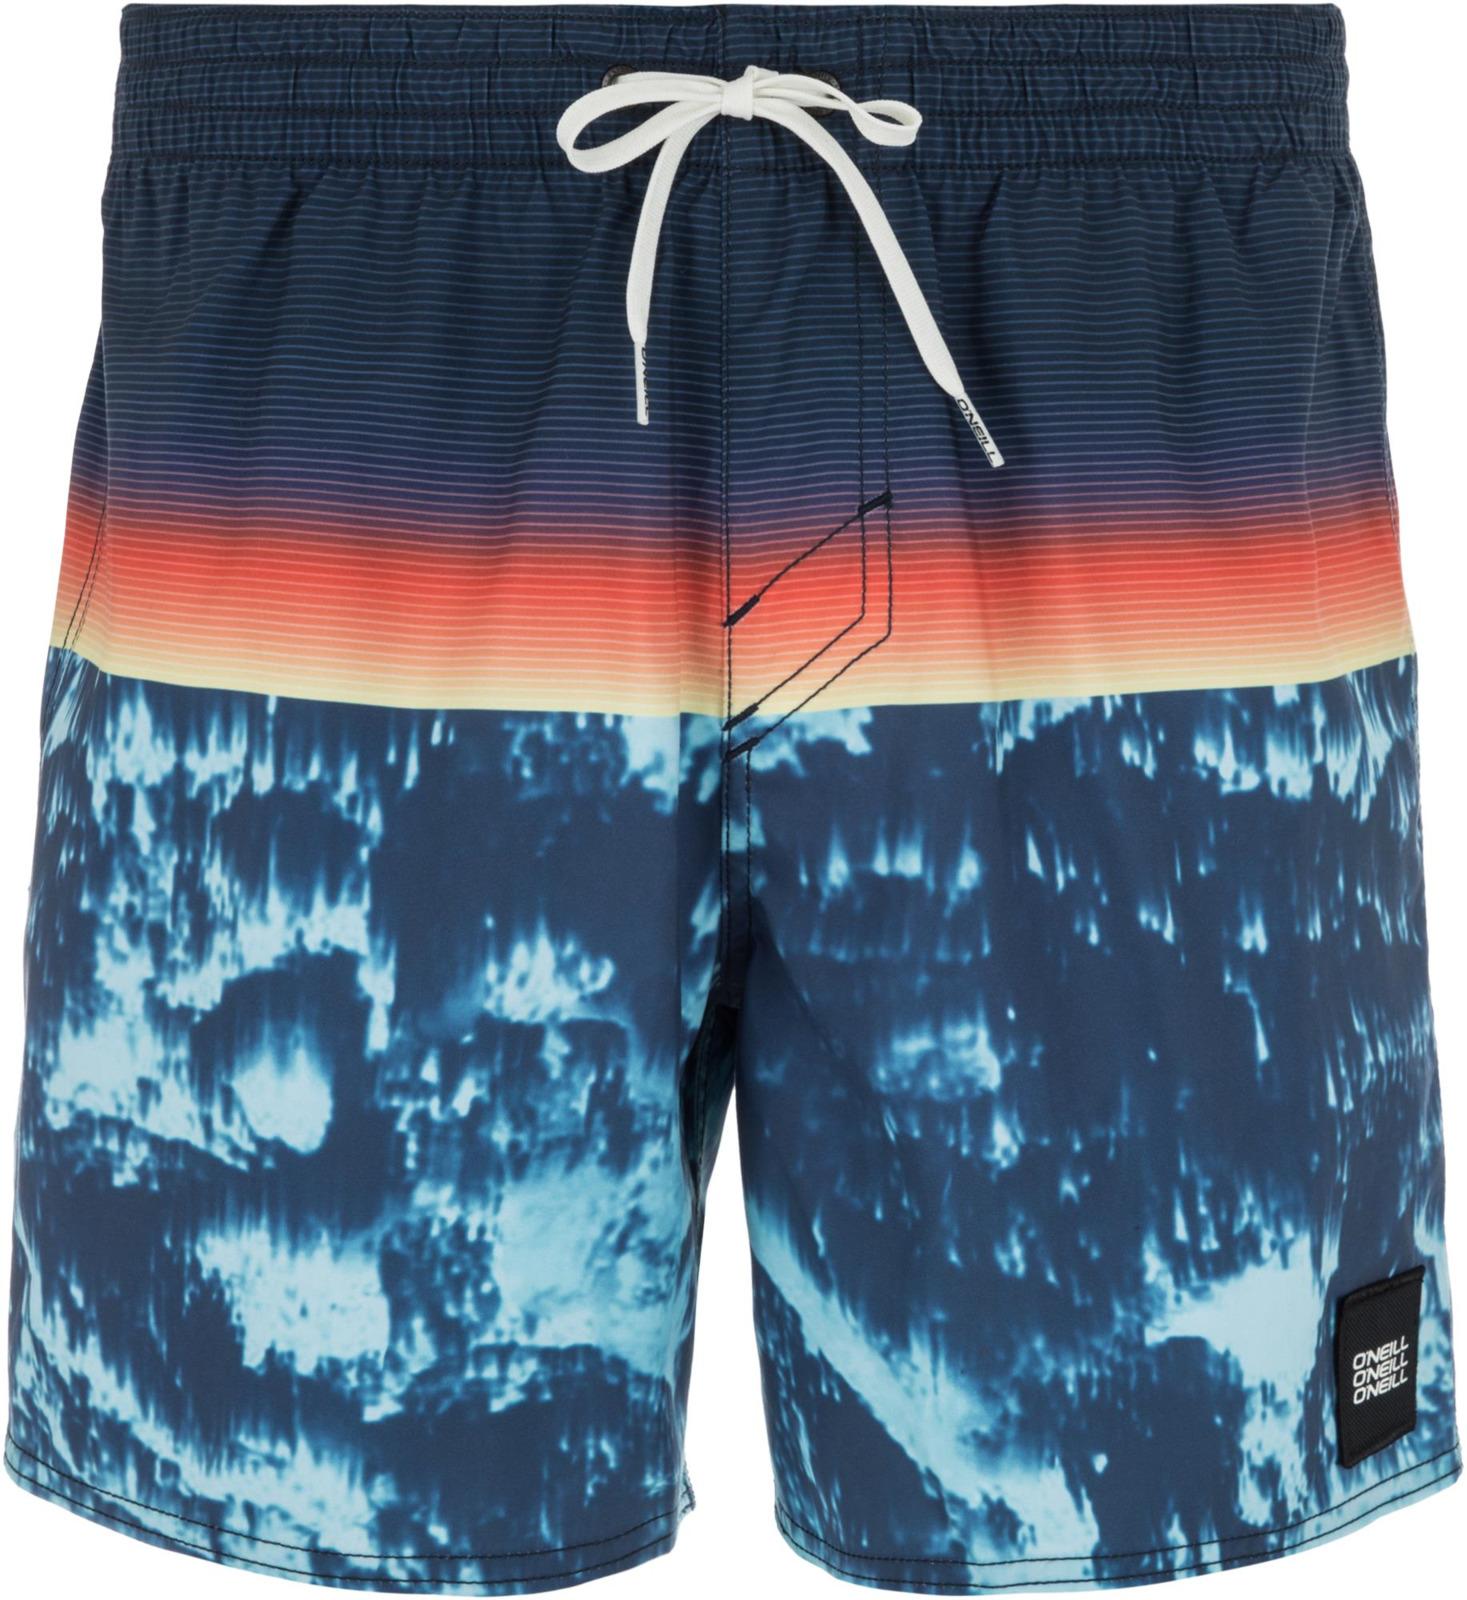 Шорты O'Neill шорты мужские o neill hm sunrise shorts цвет синий оранжевый 9a3615 5900 размер s 46 48